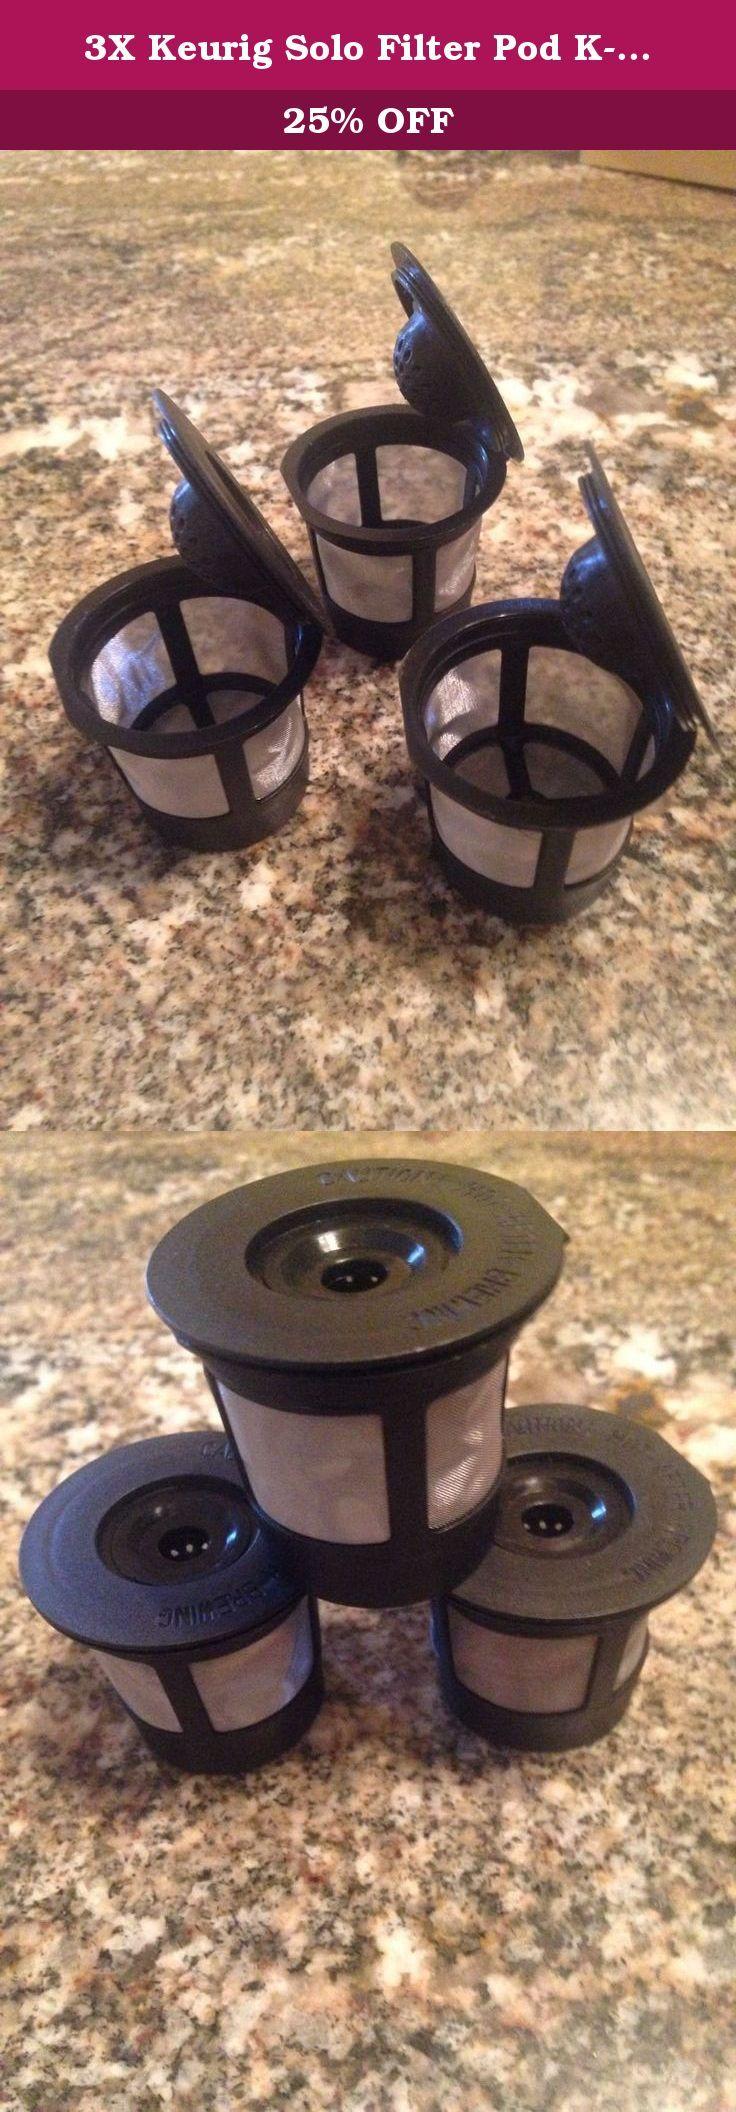 3X Keurig Solo Filter Pod KCup Coffee K65 K60 Spec